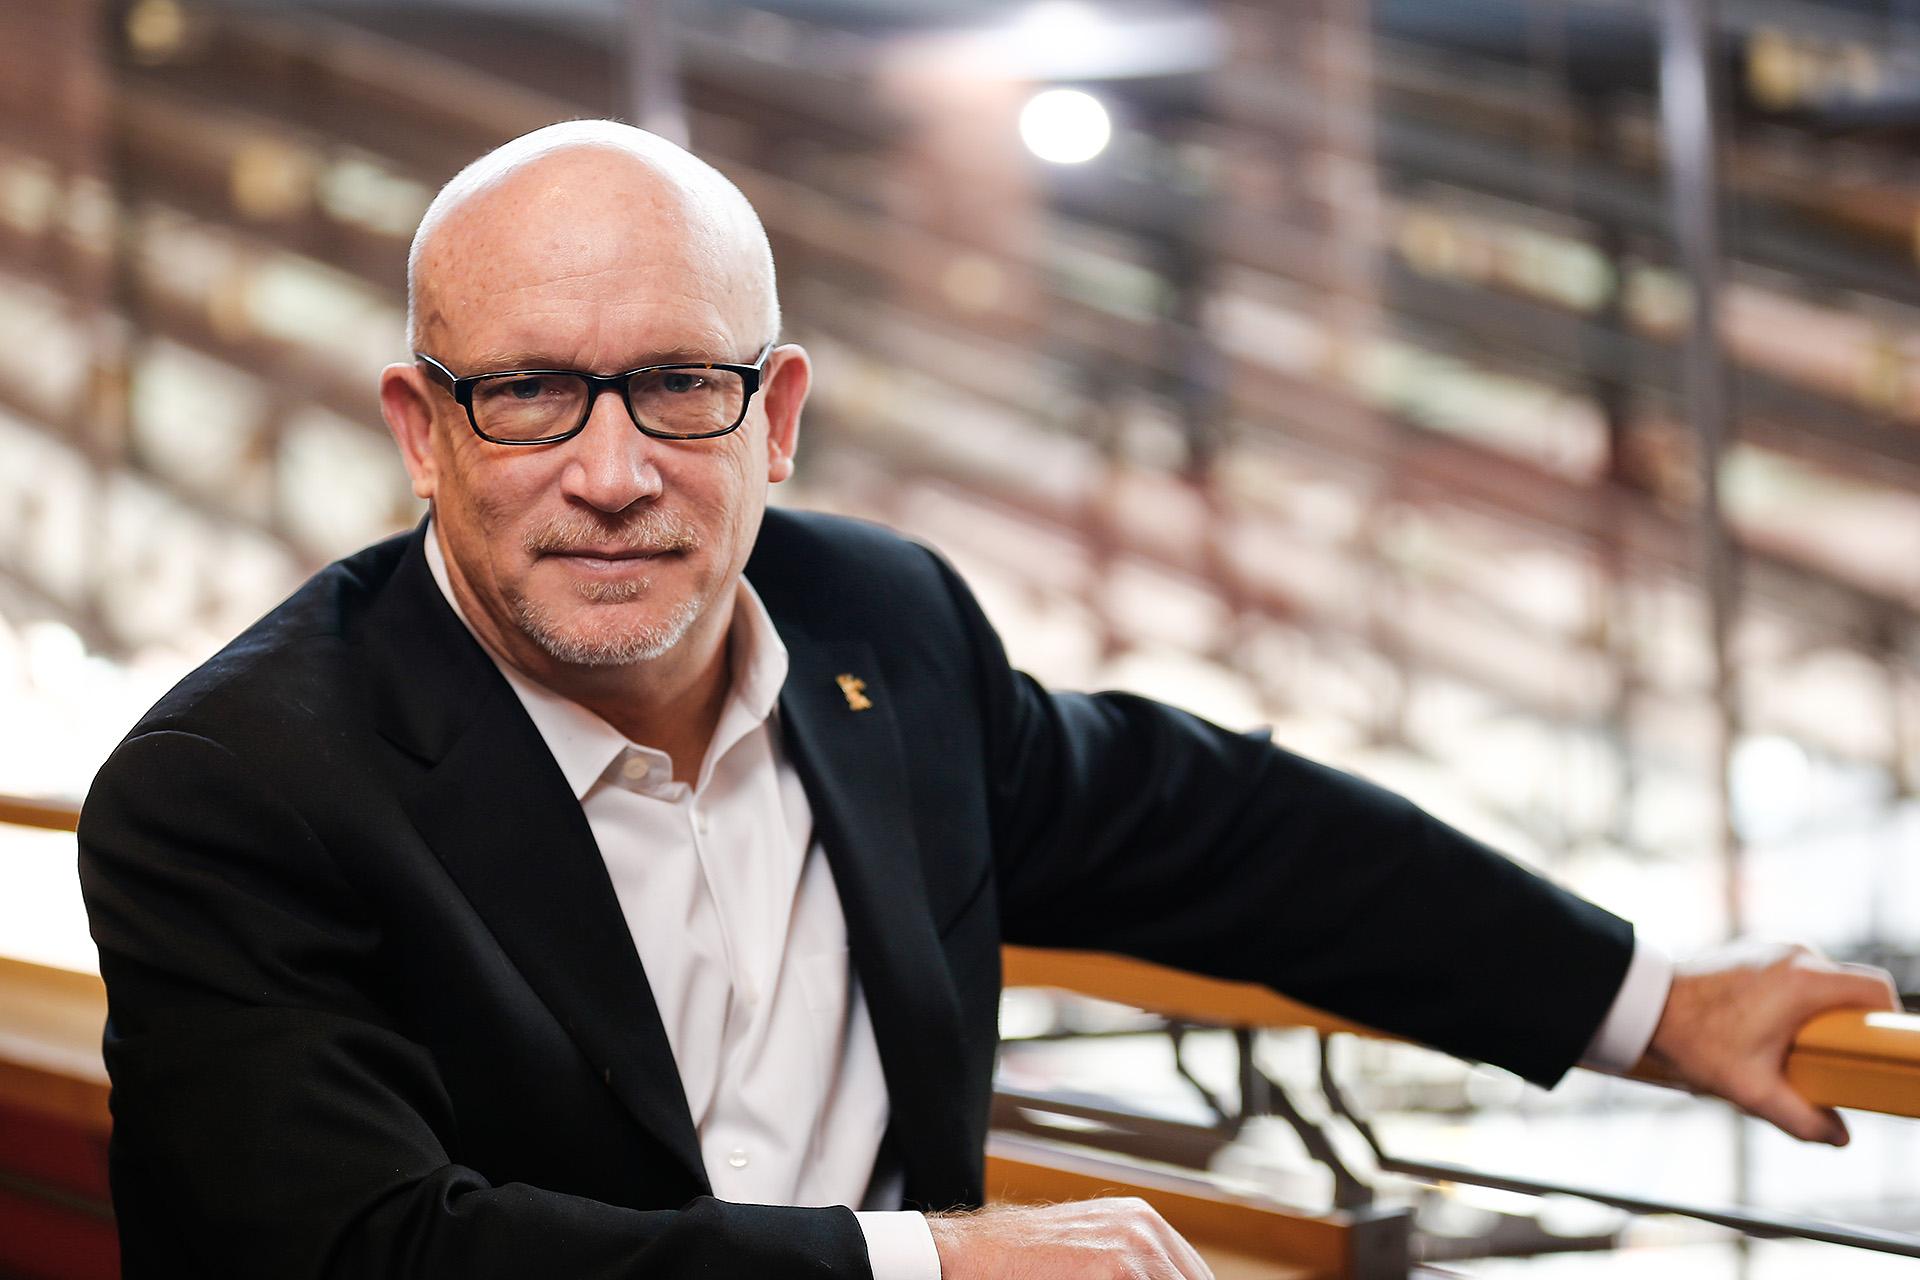 Alex Gibney, Director